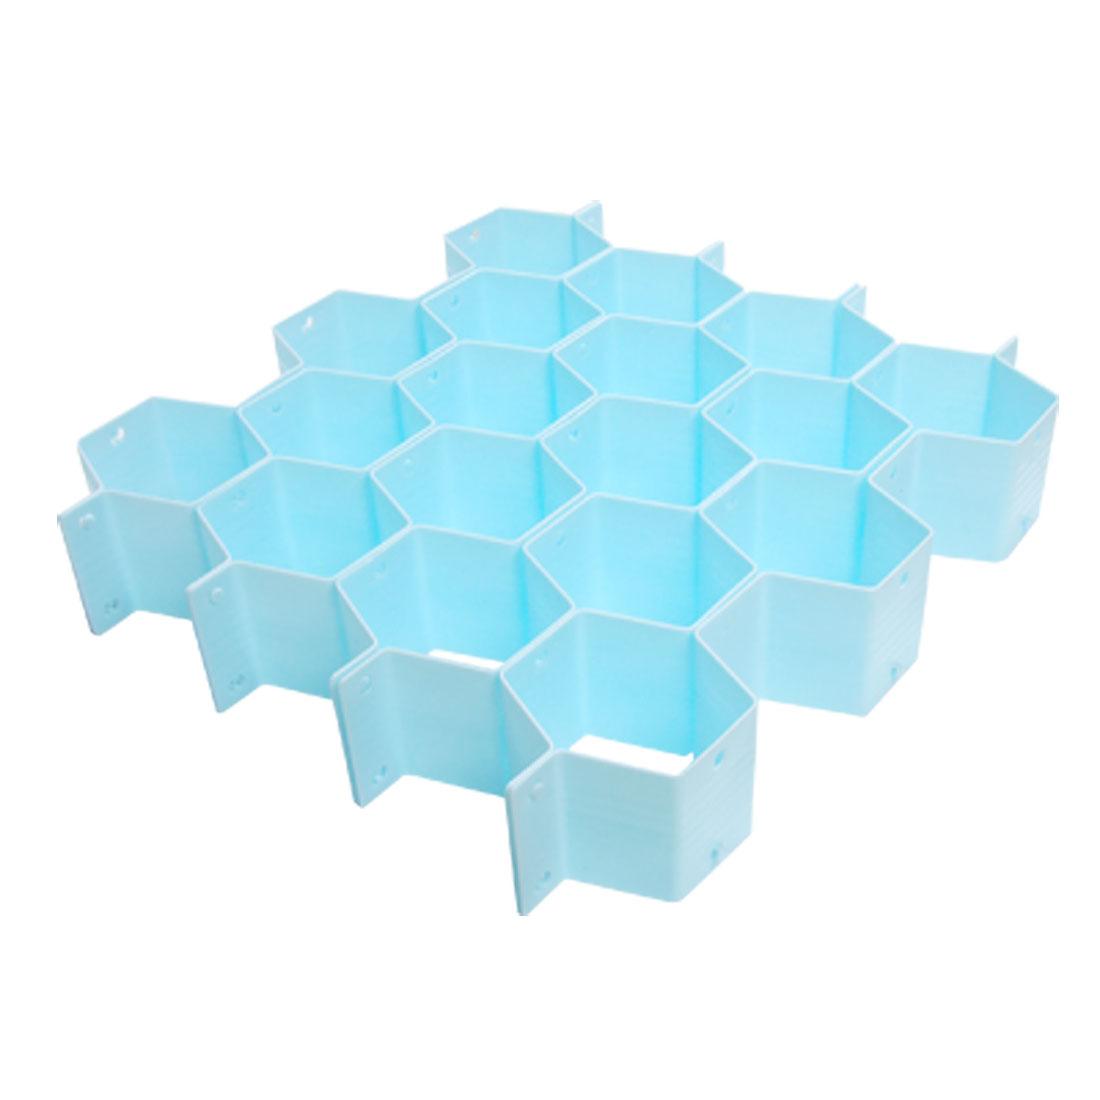 Unique Bargains Interlock Honeycomb Partition Scarves Socks Drawer Cabinet Clapboard Blue